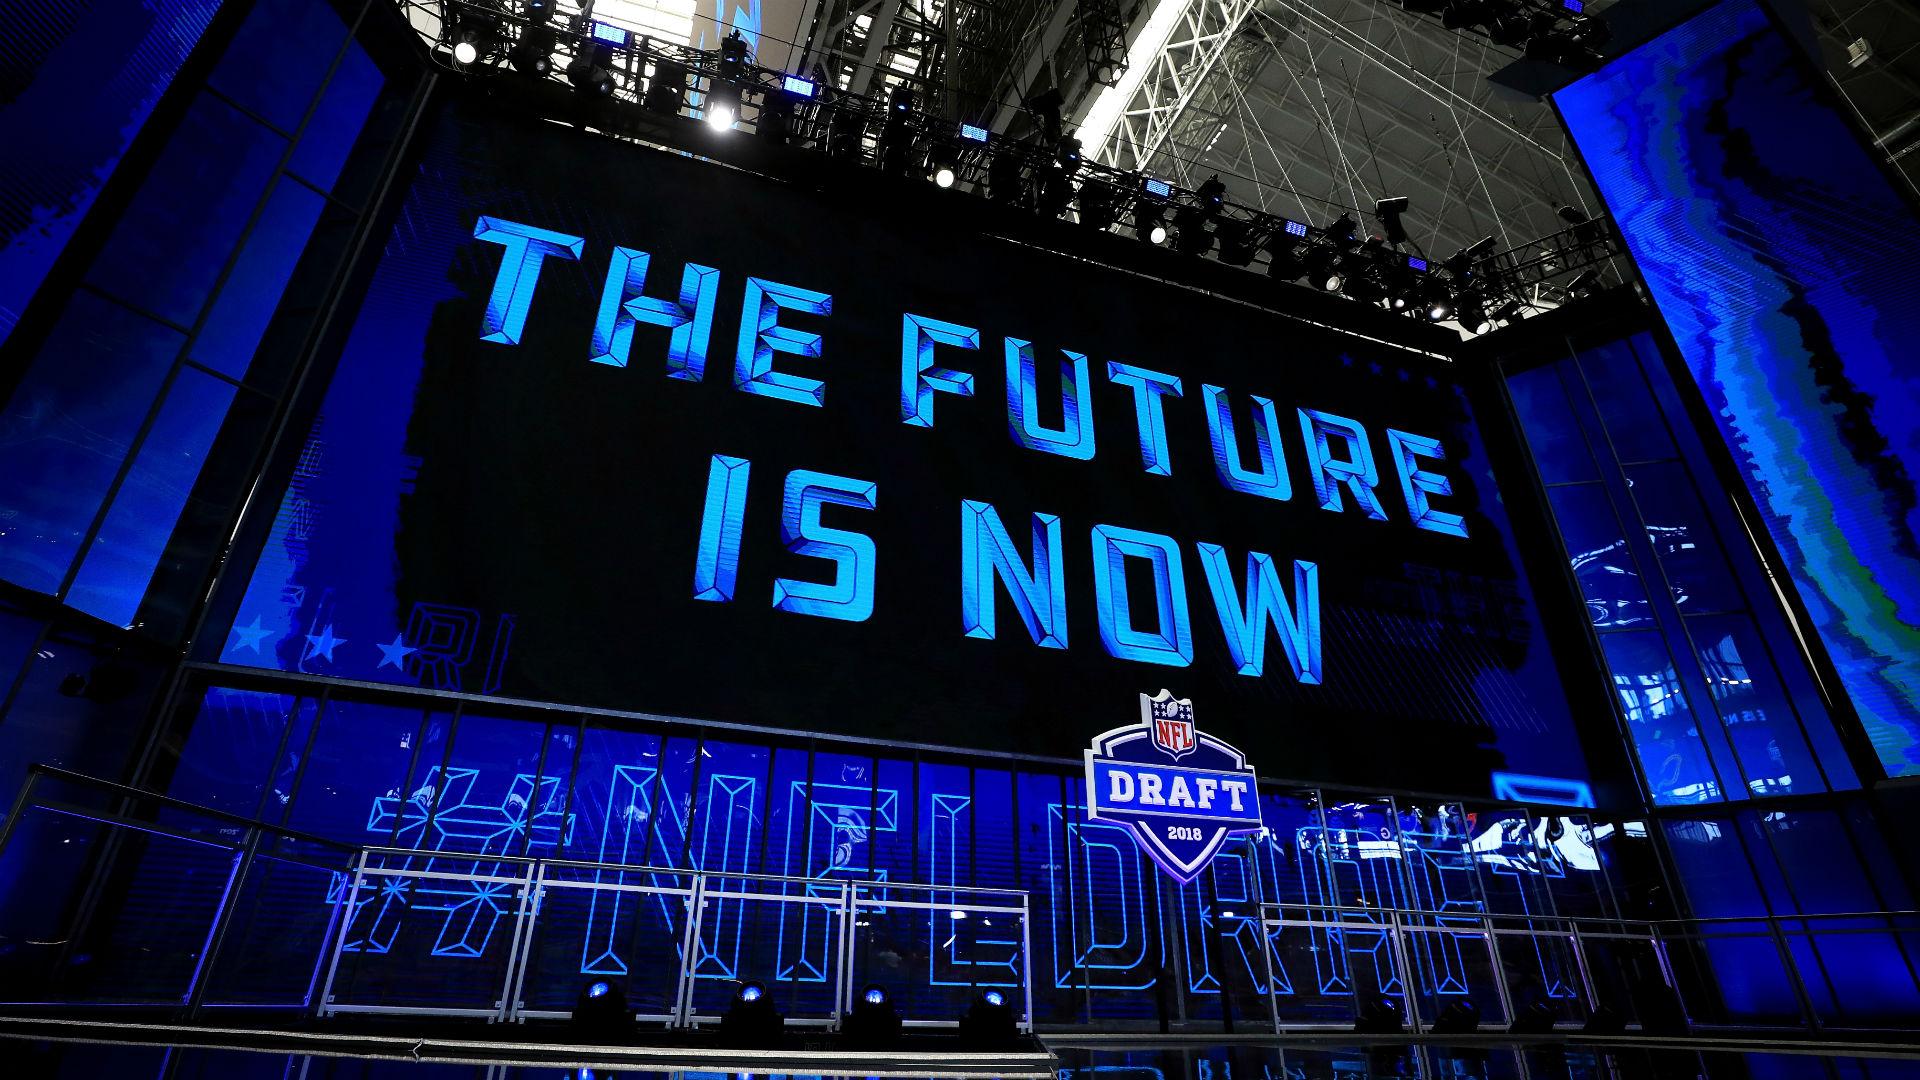 Nfl Draft 2019 Date Time Order Of Picks Tv Channel Live